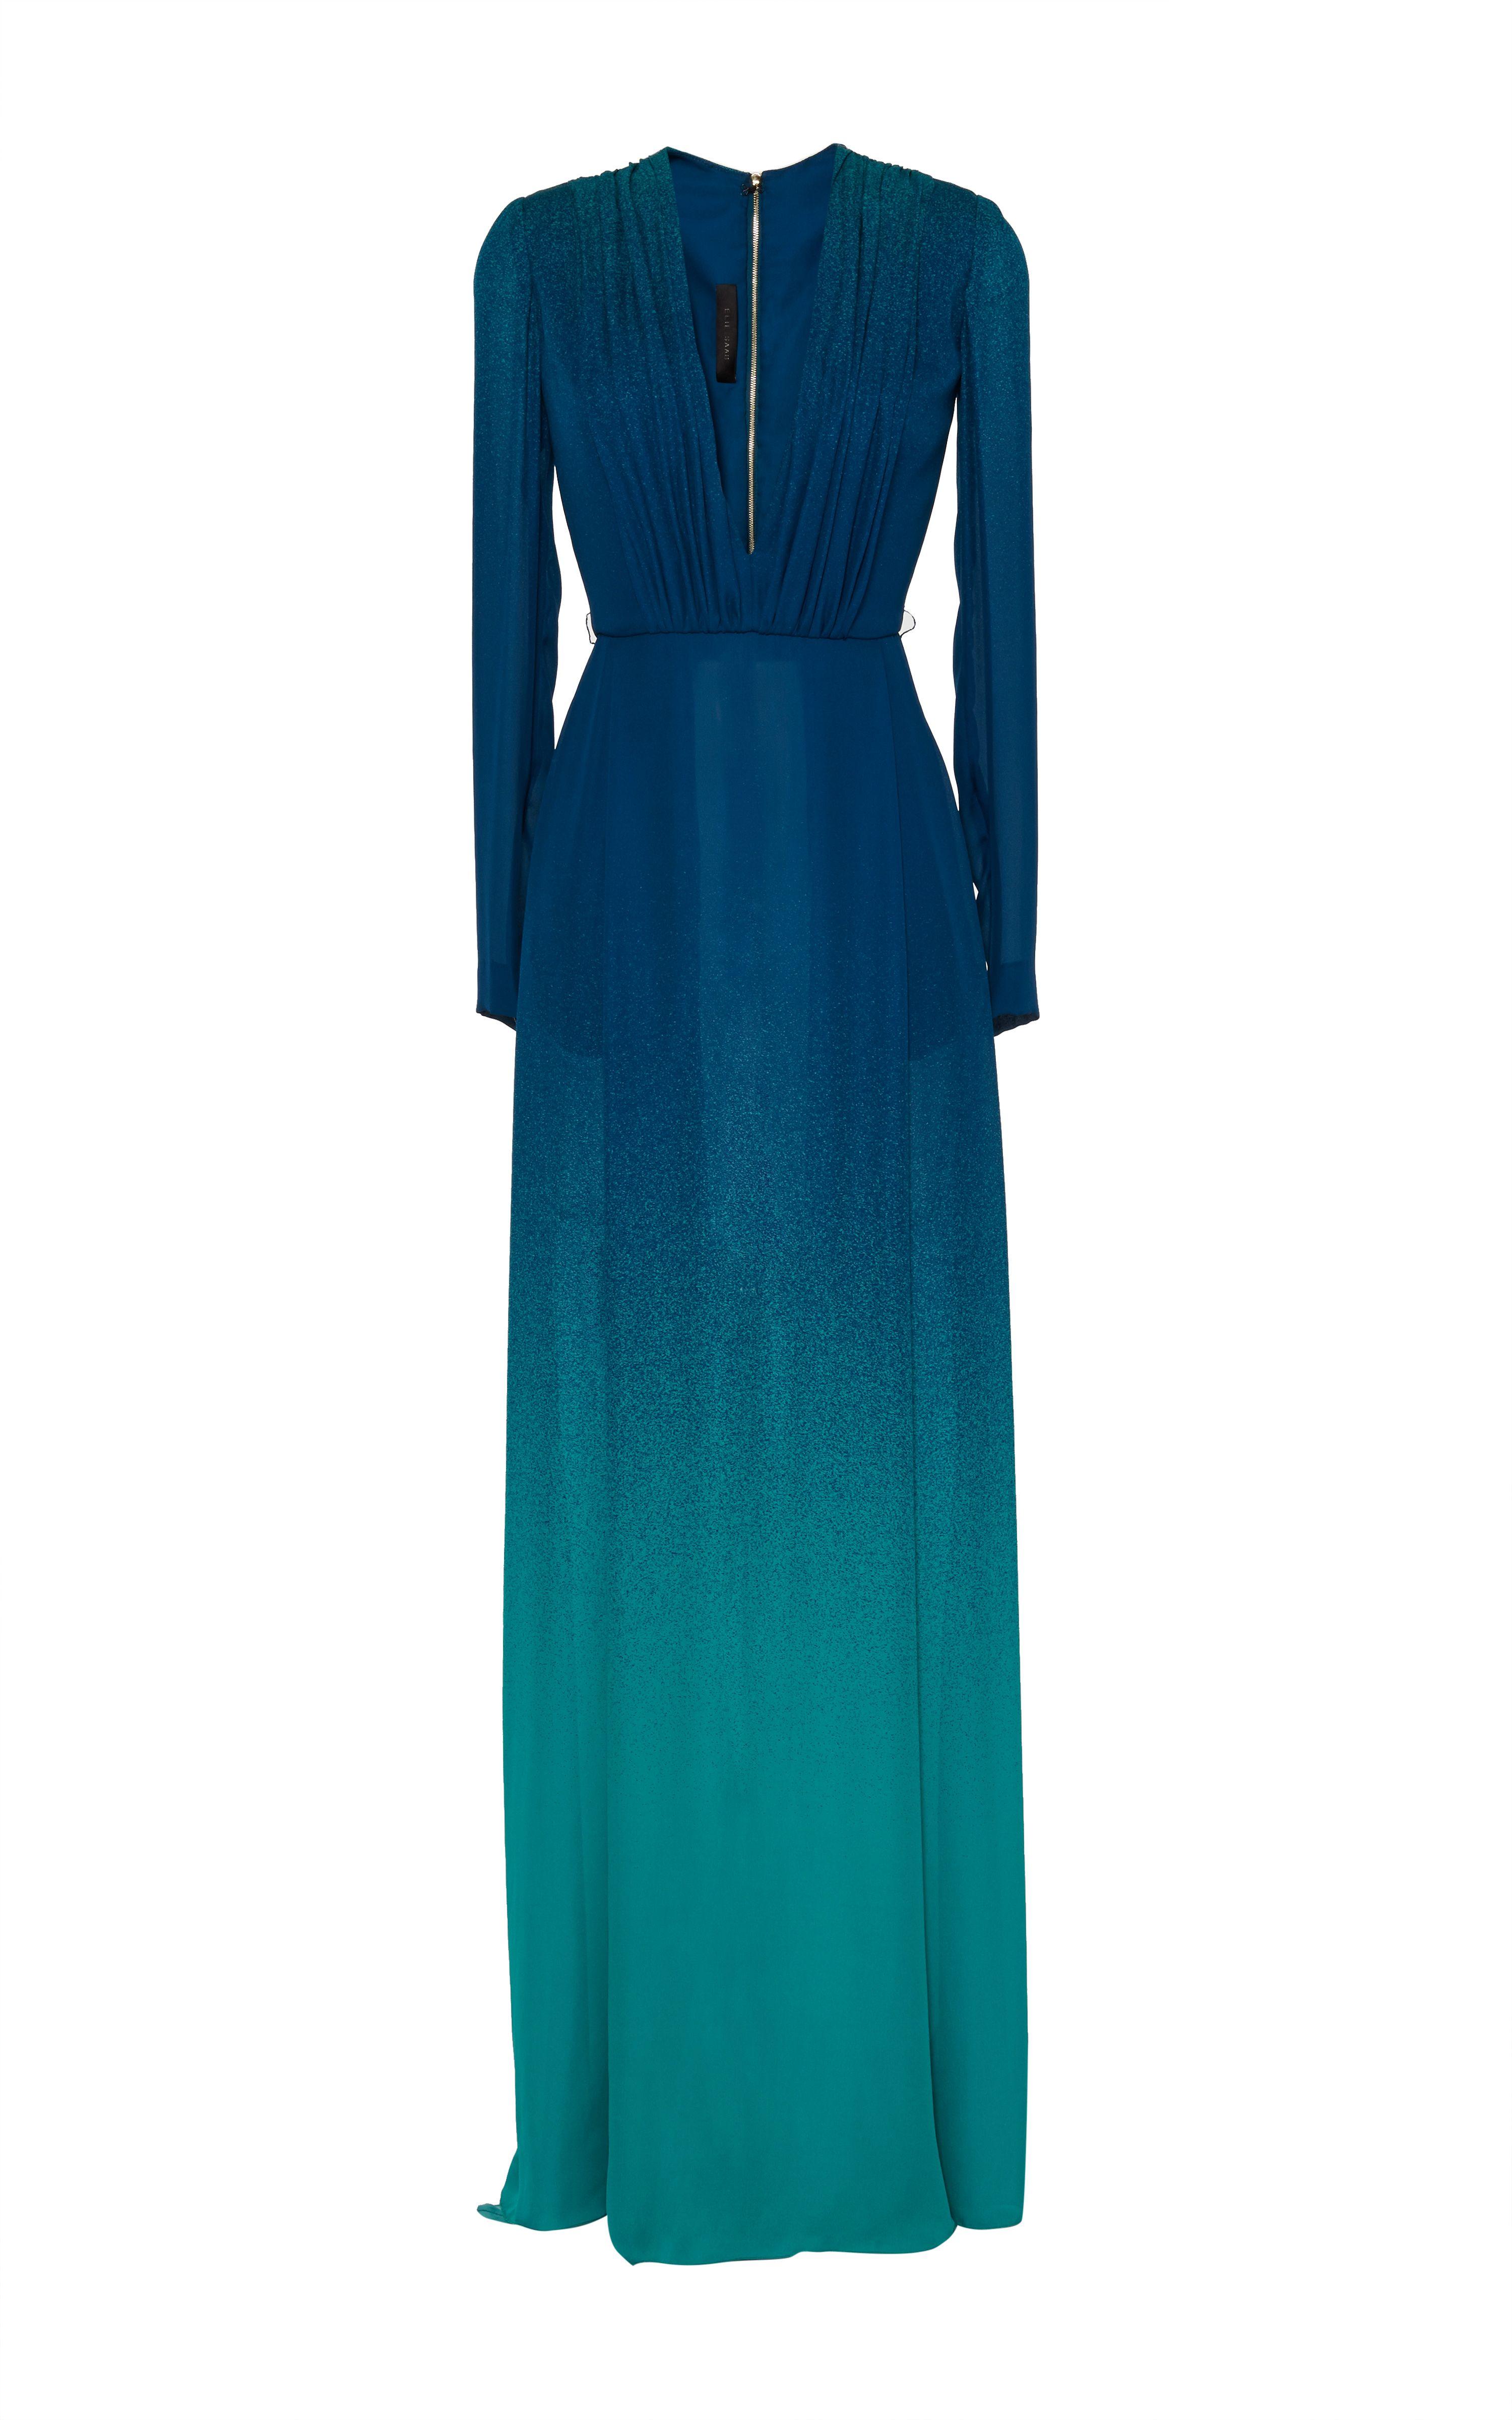 687753cede Blue Degrade Double Silk Georgette Dress by Elie Saab for Preorder on Moda  Operandi